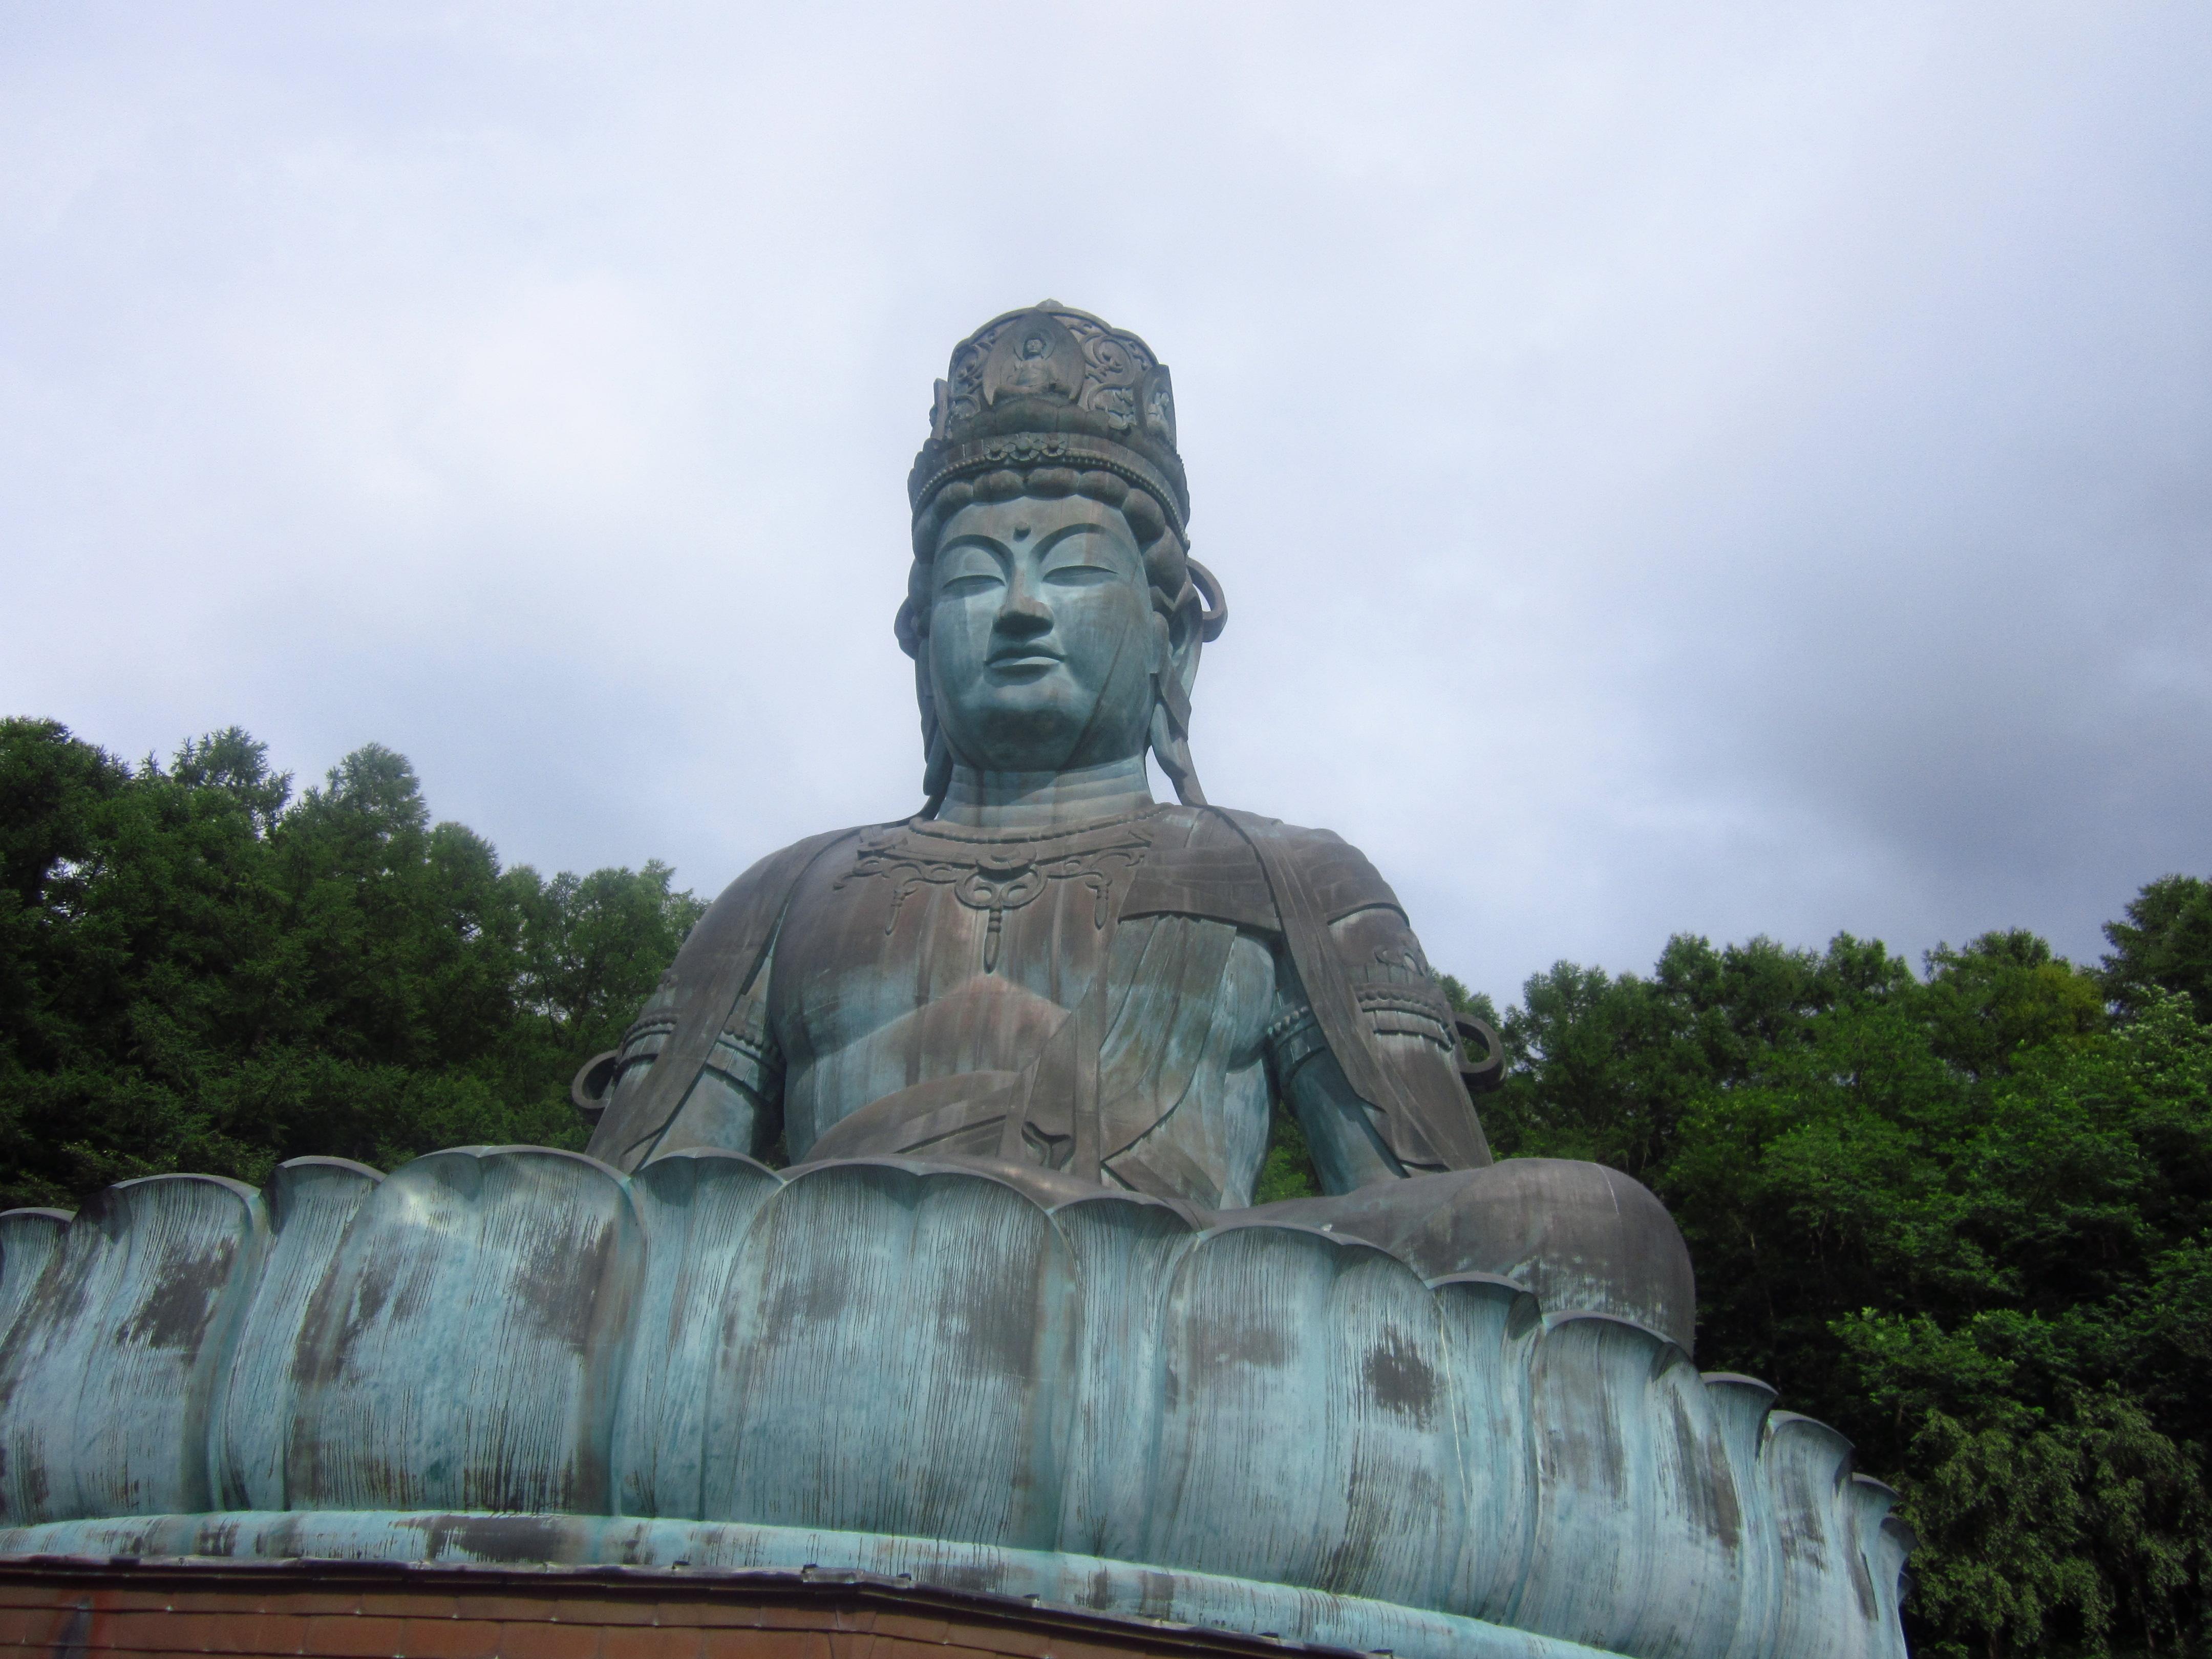 IMG 10641245 - 外国人観光客に人気の高山稲荷神社